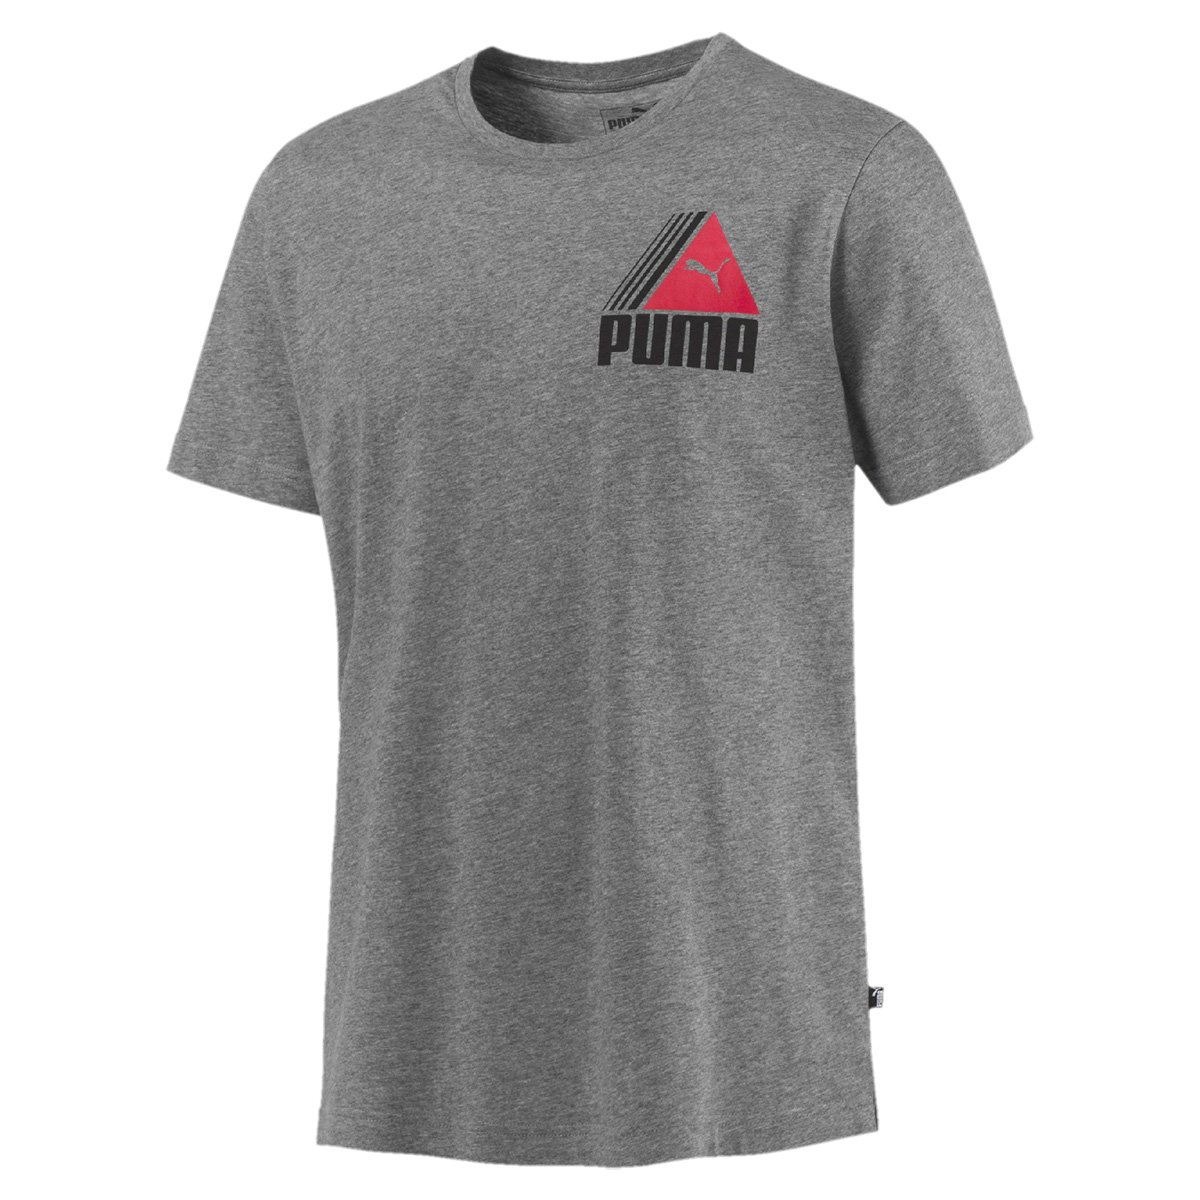 Camiseta Puma TRI Retro Masculina - Cinza - Compre Agora  a0a1d88494bc0